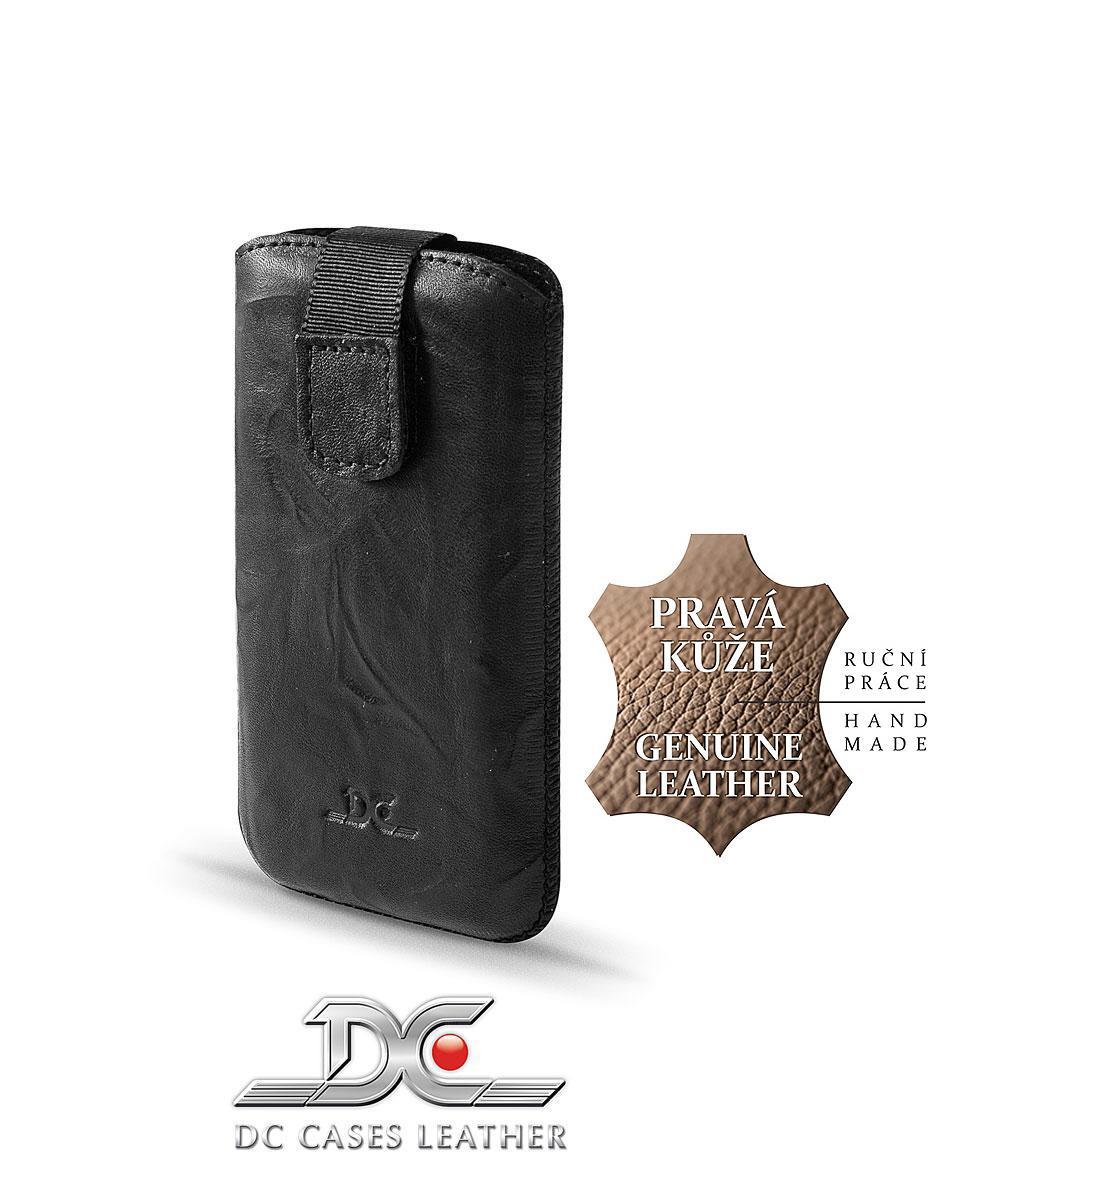 DC (TOP) POUZDRO L T26 Protect Washed ČERNÉ (N97, IPHONE 4G, HTC DESIRE ..)